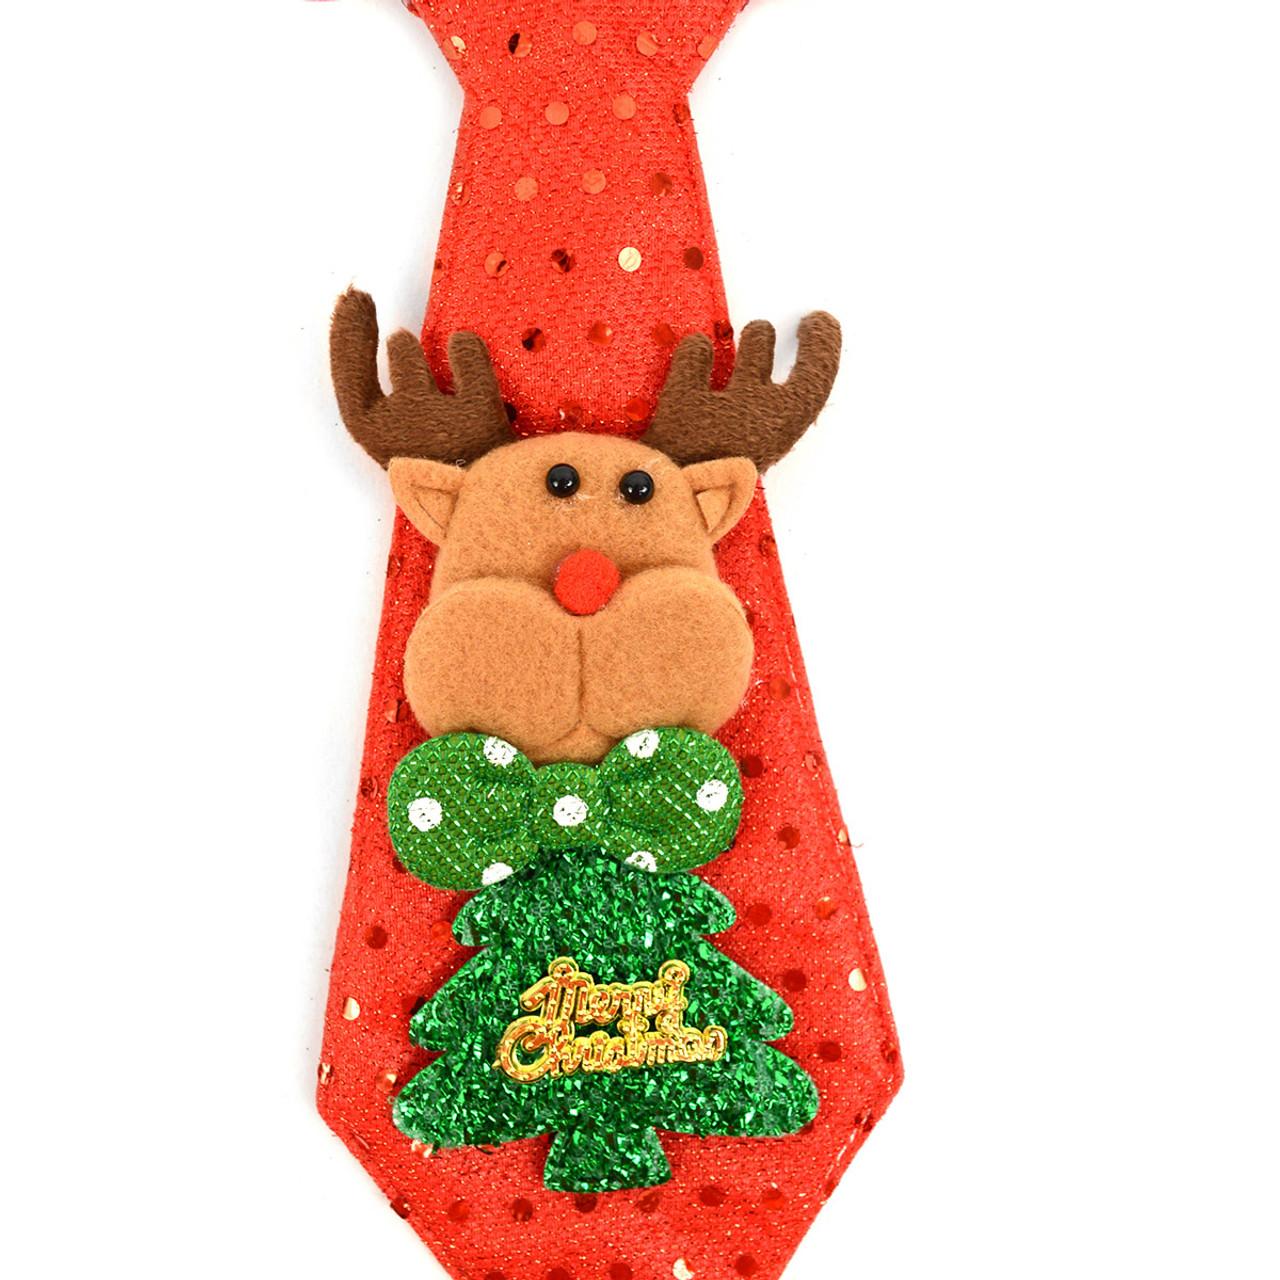 Christmas Tie.Light Up Reindeer Christmas Tie Xap5313 Rd